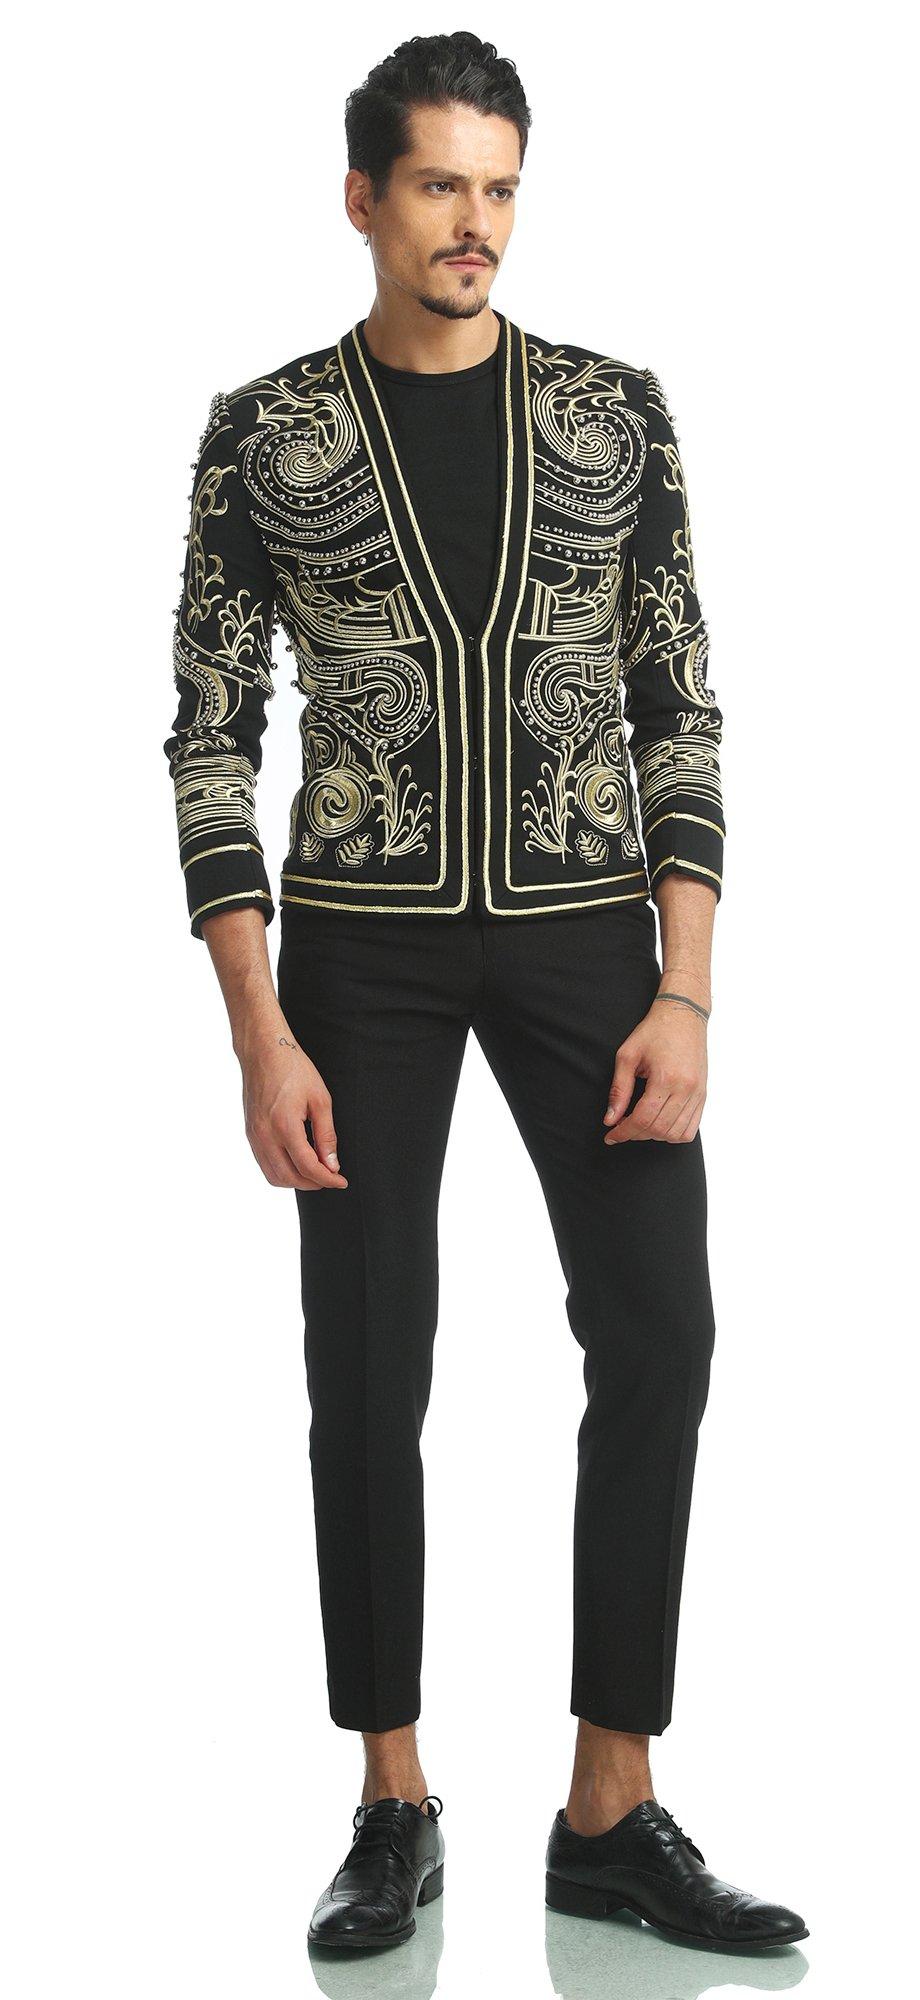 Pizoff Men's Luxury V-Neck Slim Fit Stylish Suit Blazer Jacket Long Sleeve Formal Dinner Dress AD001-02-L by Pizoff (Image #4)